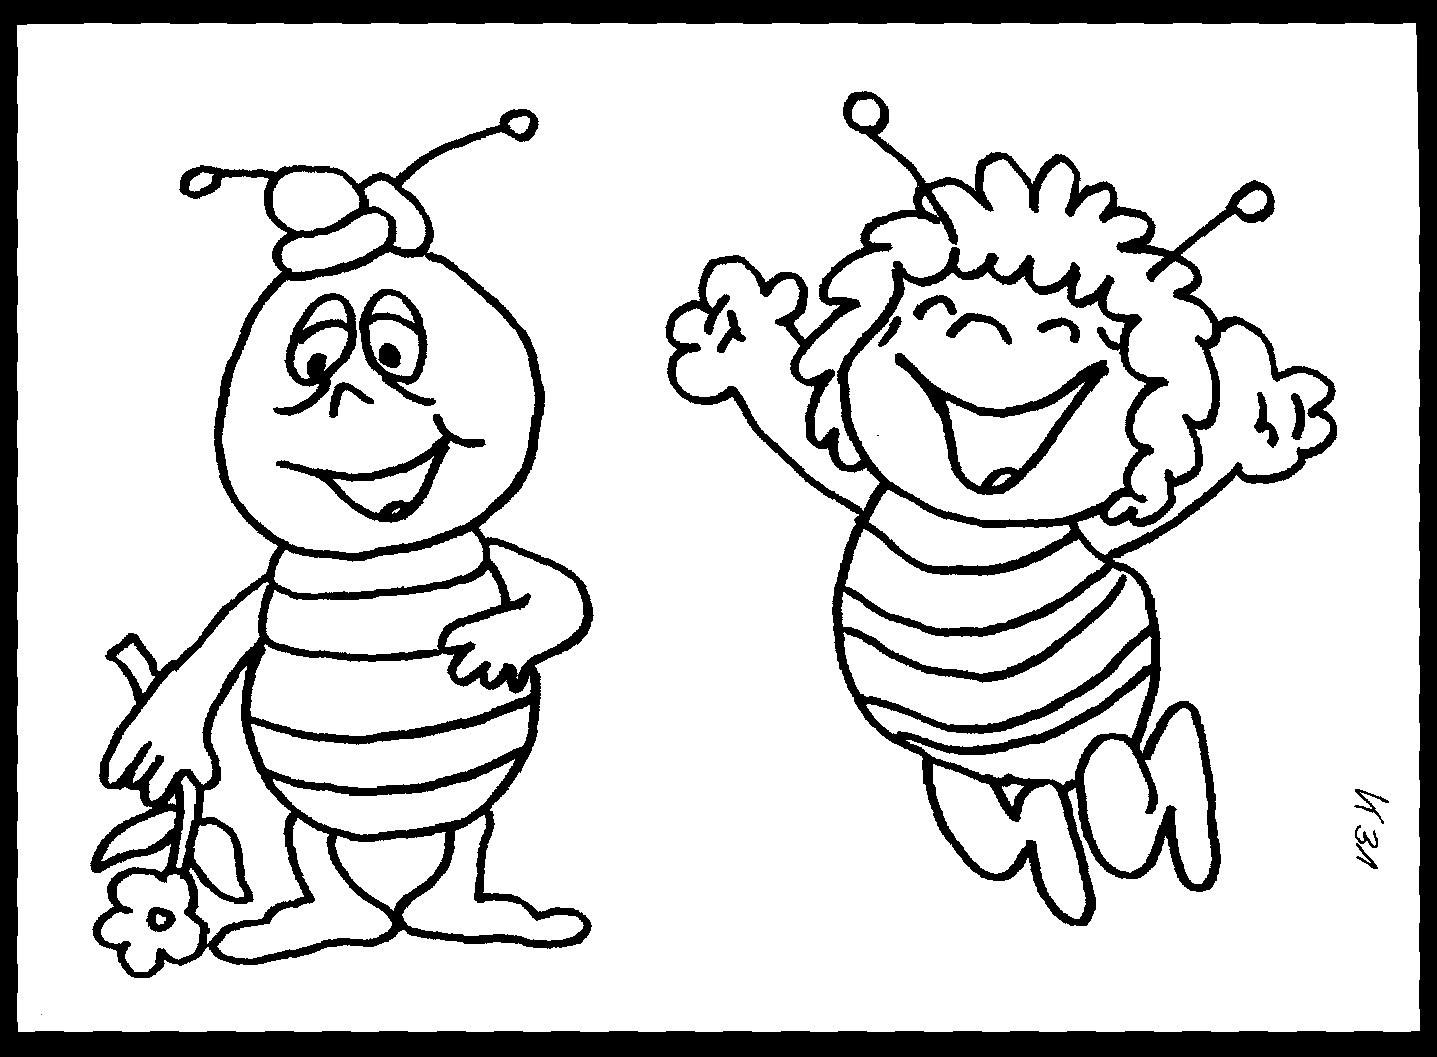 Biene Maja Und Willi Ausmalbilder Neu Ausmalbilder Biene Maja Einzigartig Pj Mask Ausmalbilder Einzigartig Galerie